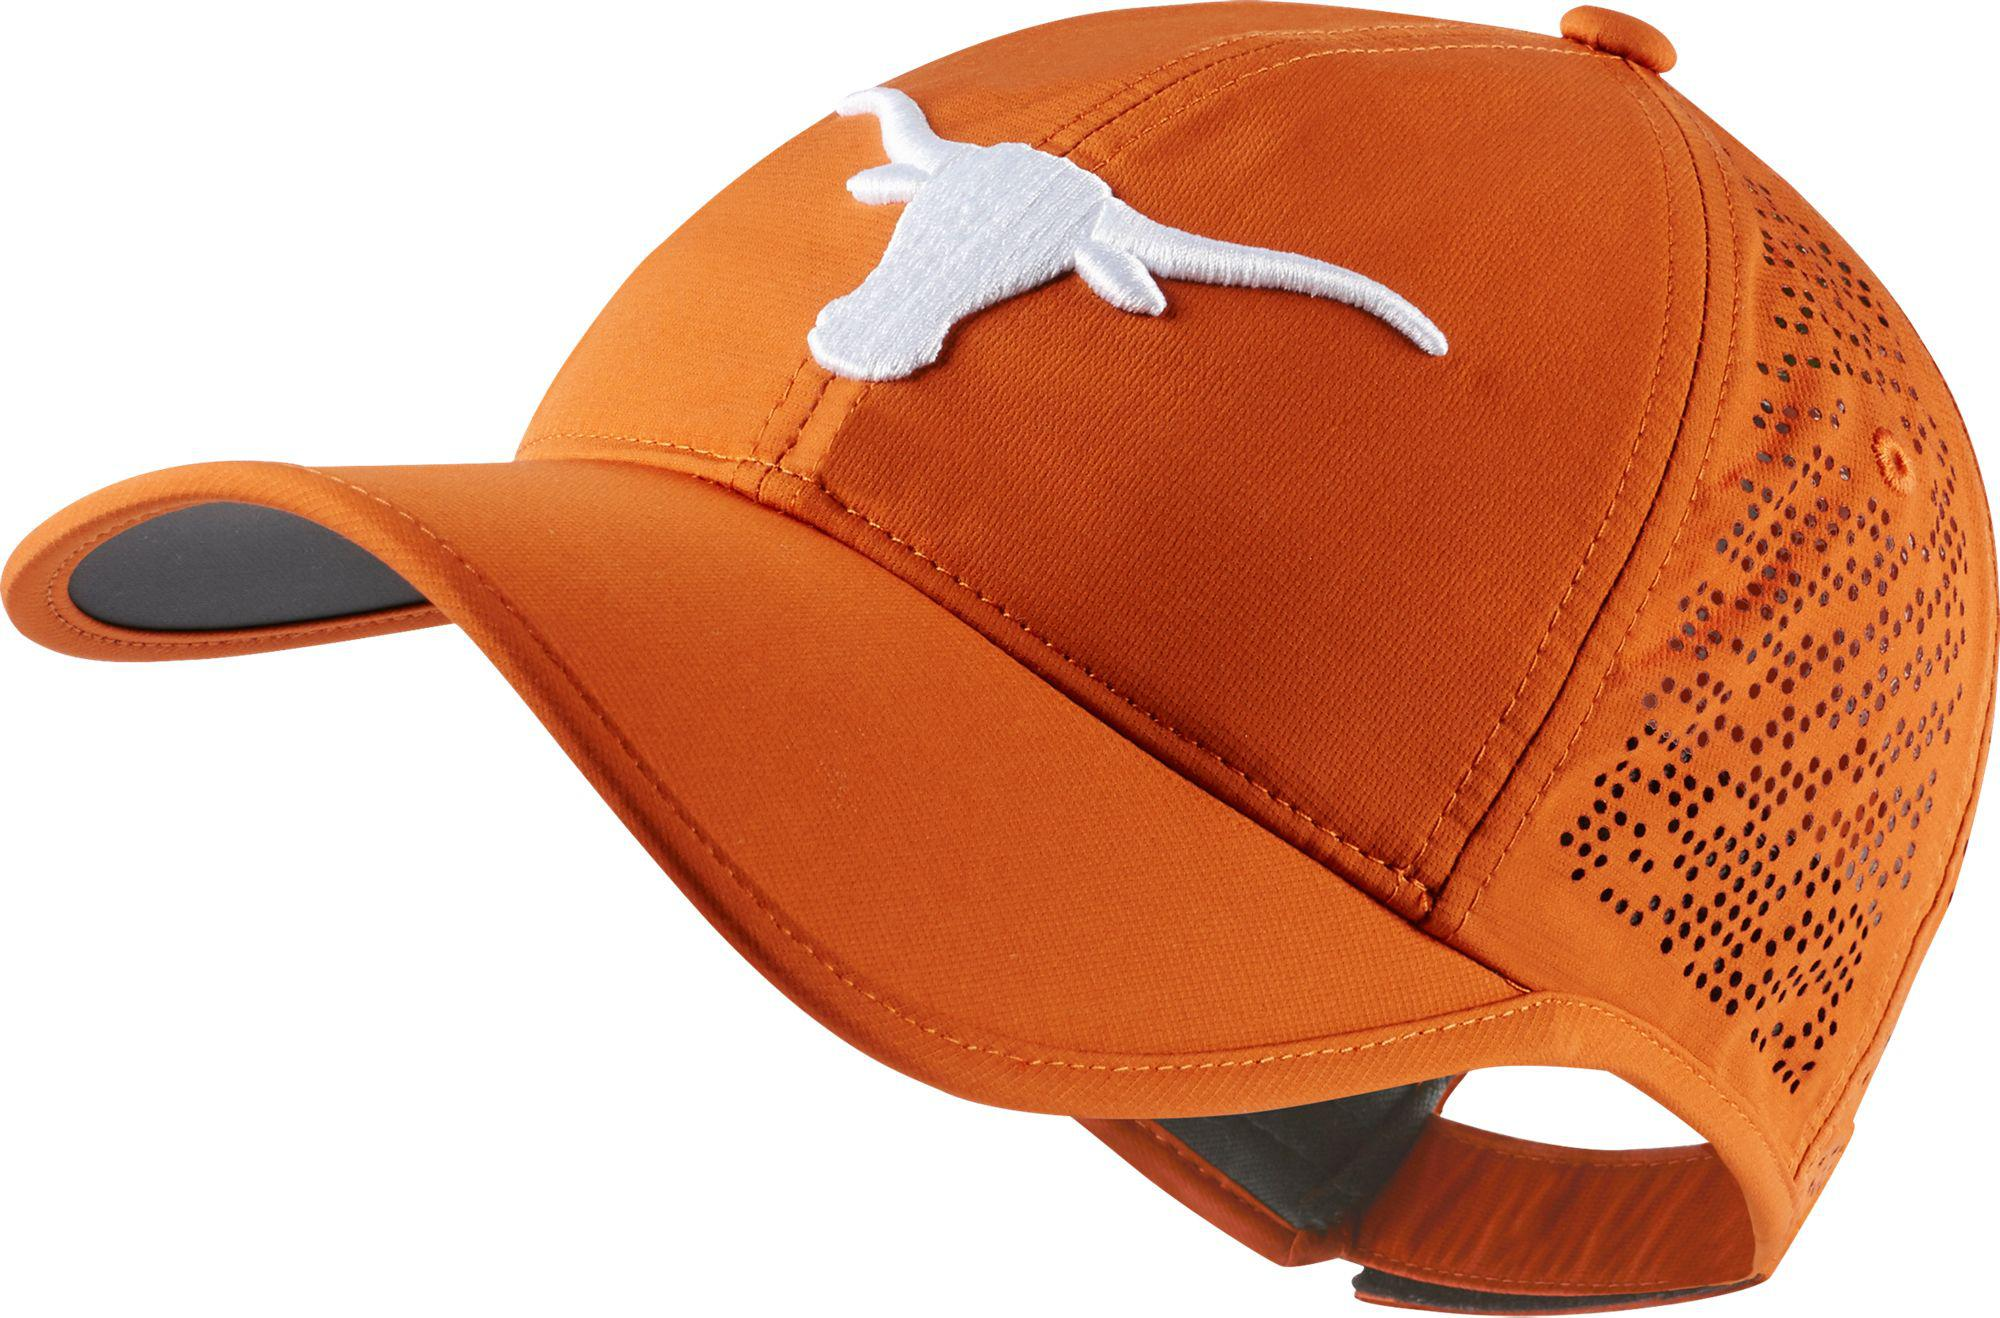 547771eeb39 ... wholesale lyst nike texas longhorns perforated golf hat in orange for  men f007d b0c79